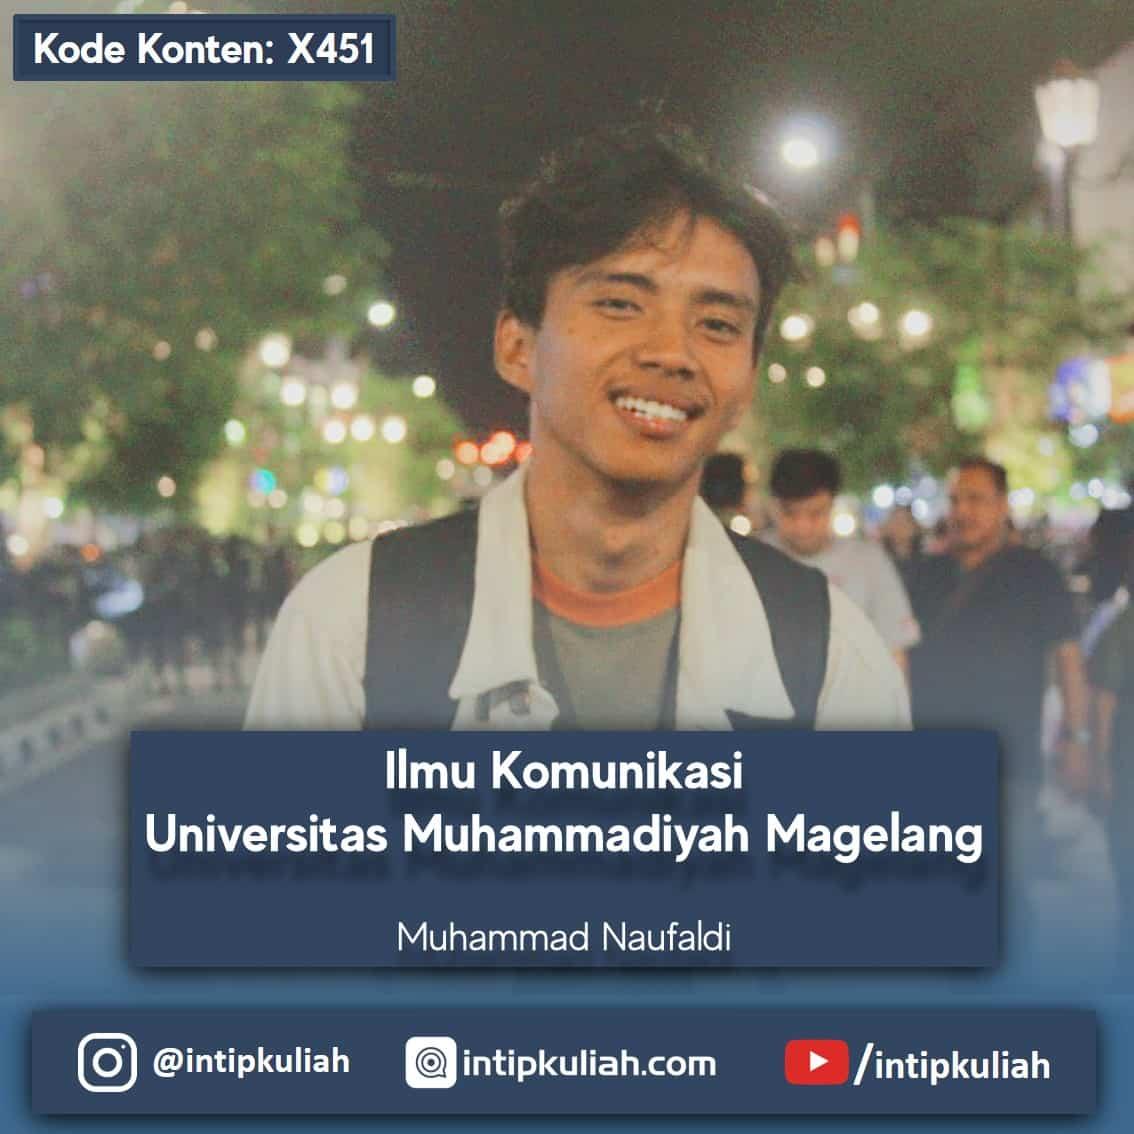 Ilmu Komunikasi Universitas Muhammadiyah Magelang (Naufaldi)